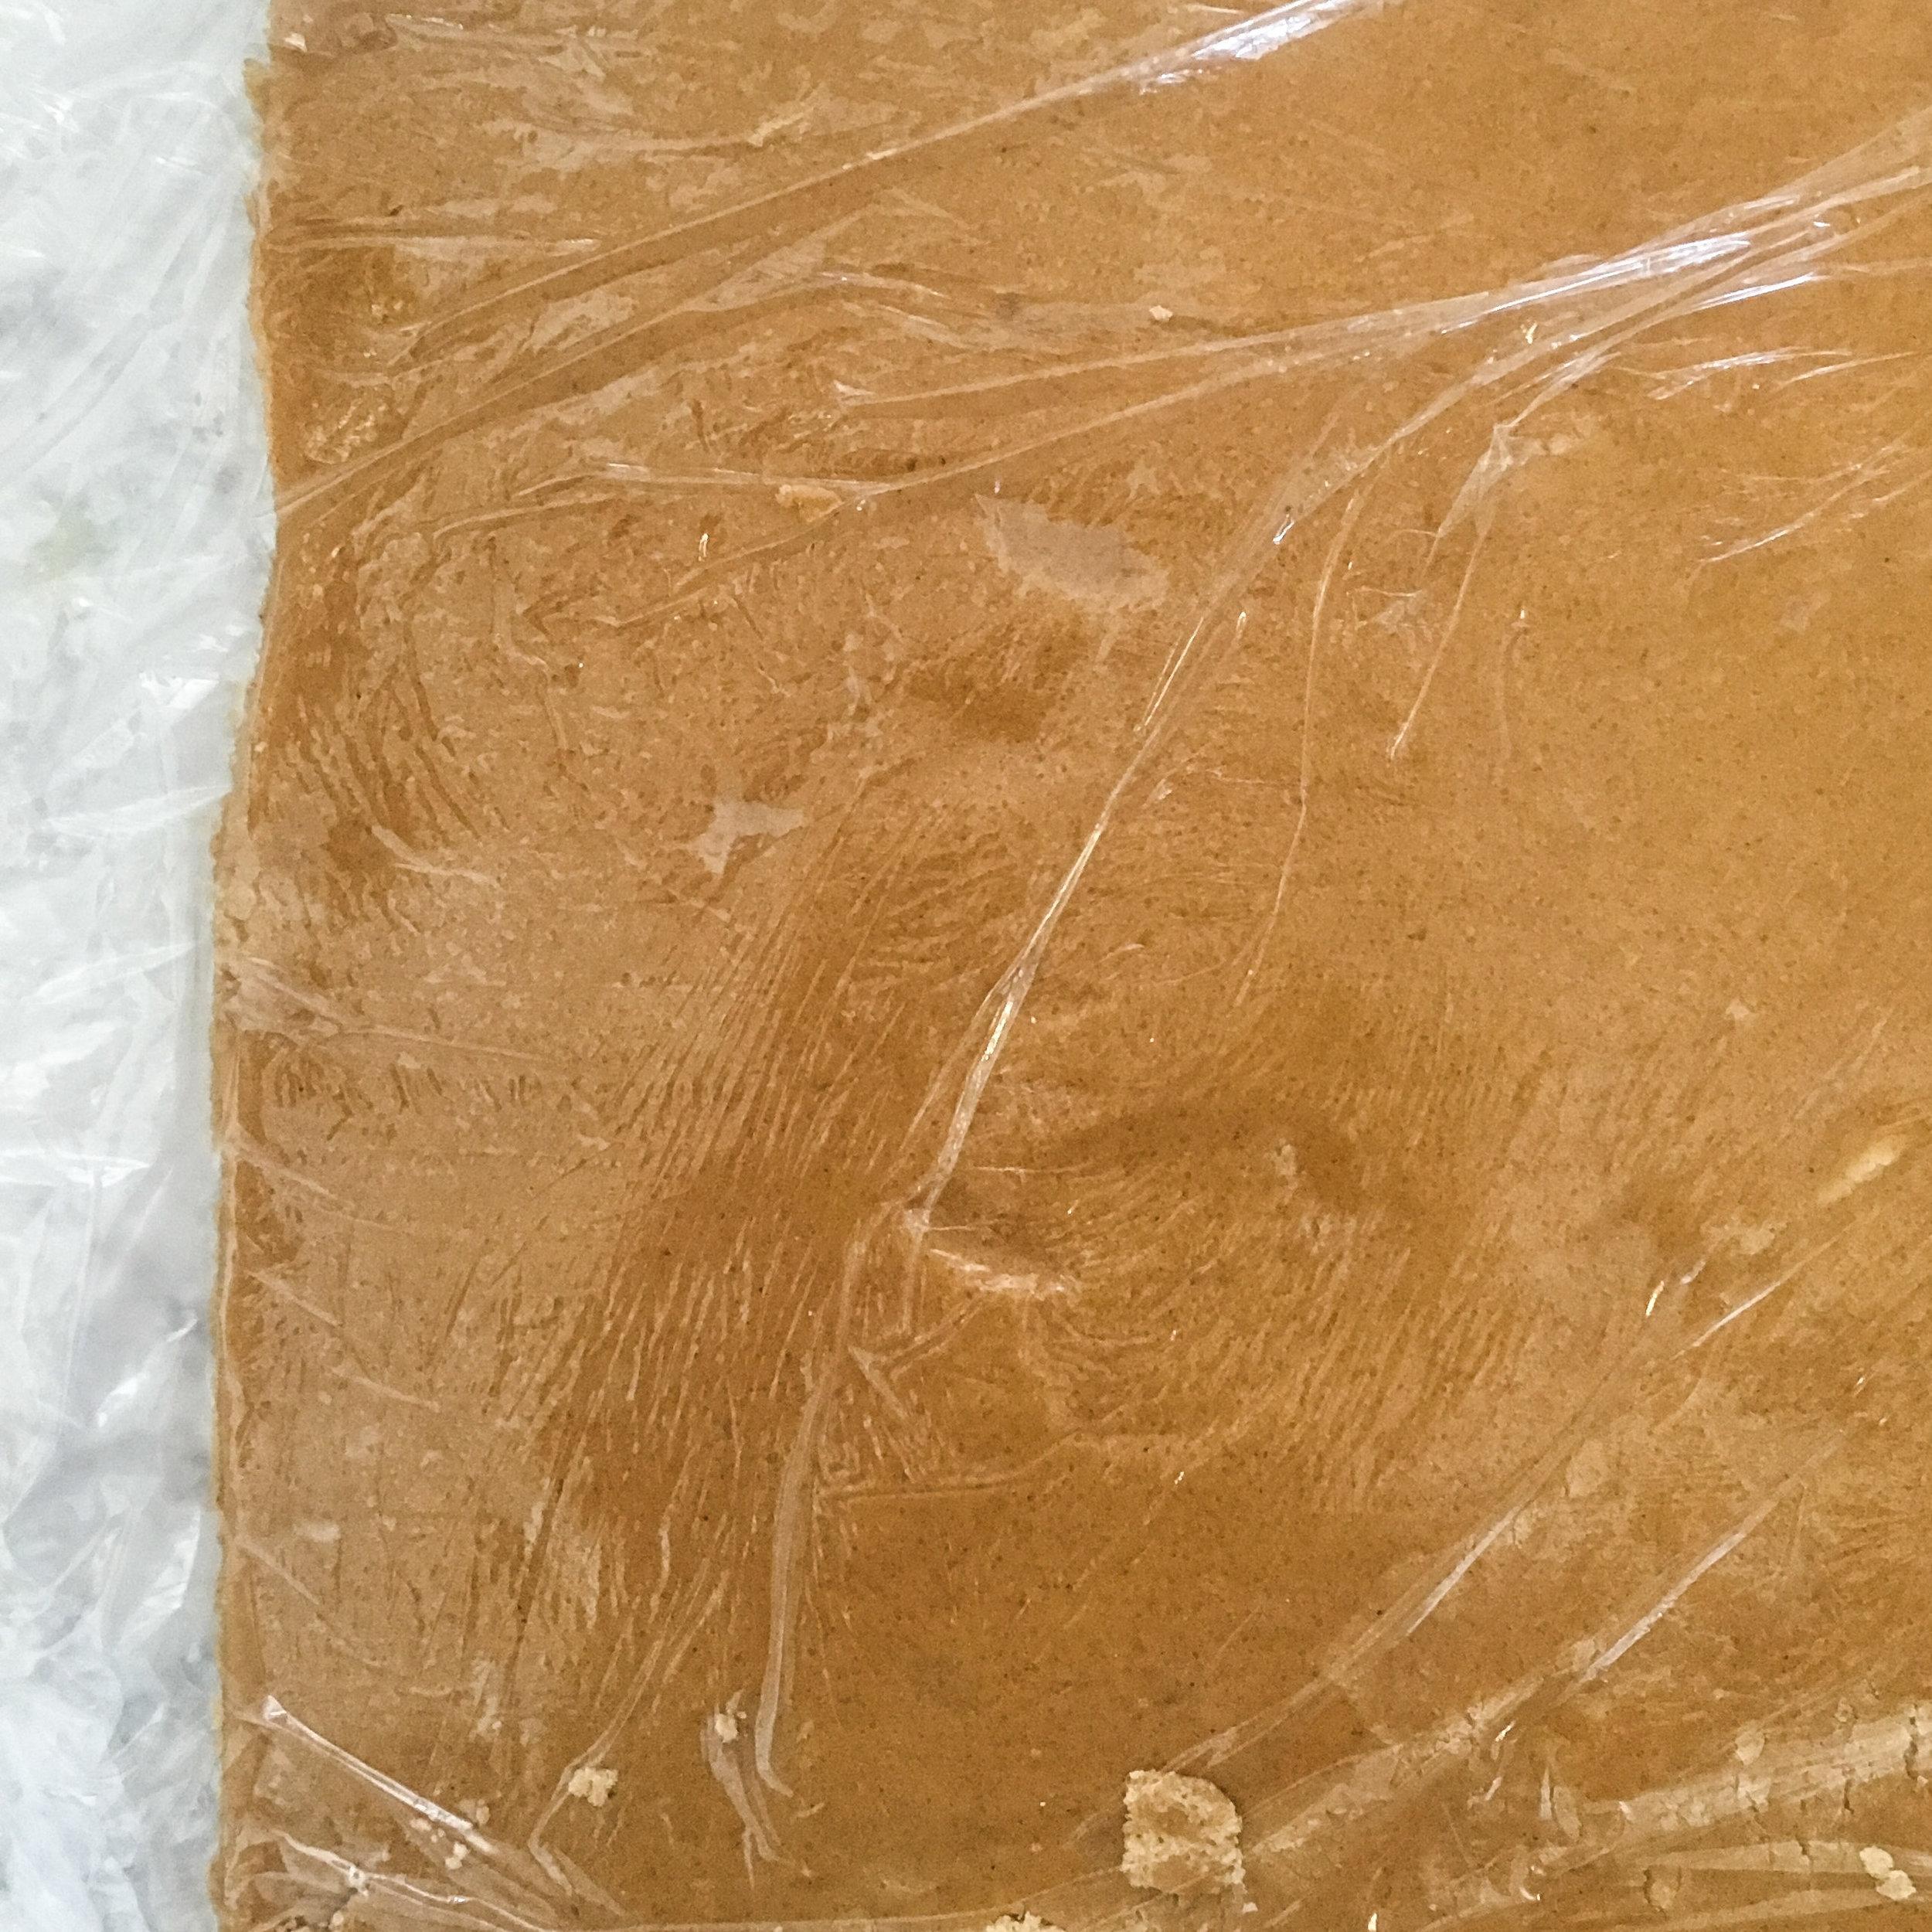 Rolling out gingerbread dough between cling film || Rachel Loewens